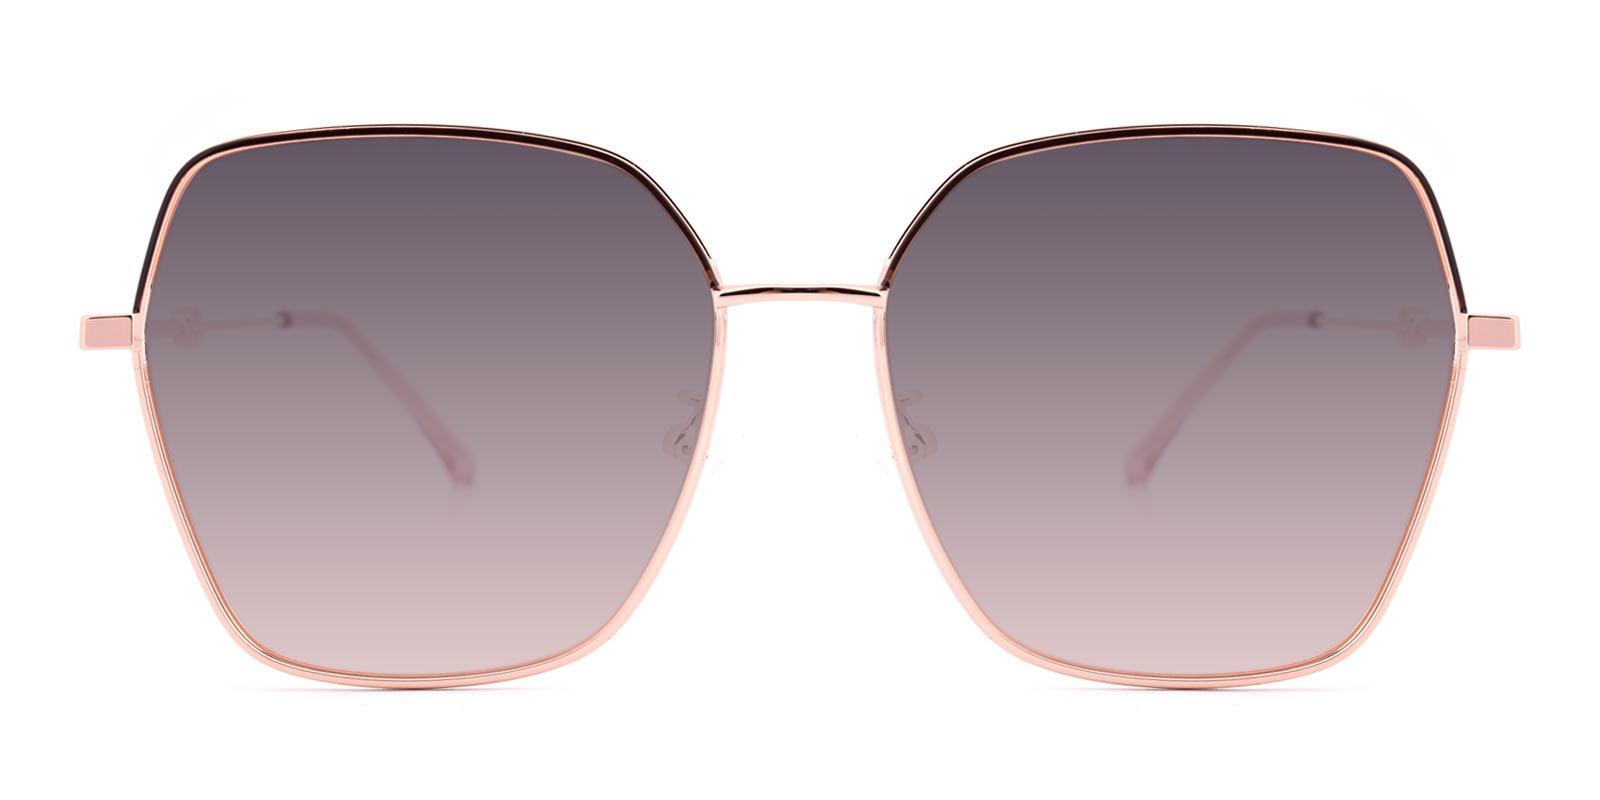 AfternoonTea-Pink-Square-Metal-Sunglasses-detail